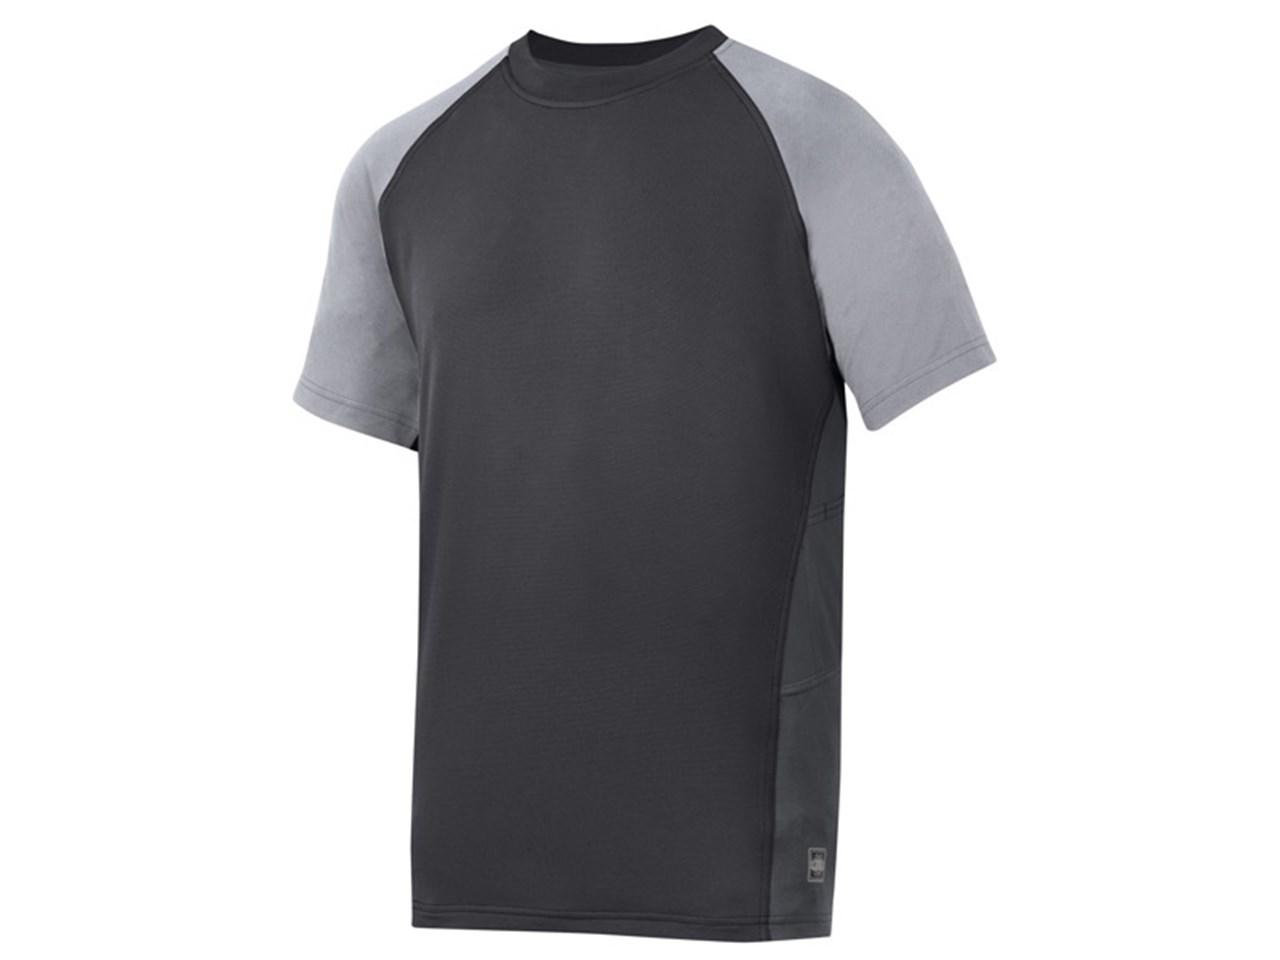 4da967512ca Snickers 25090418006 AVS Advanced T- Shirt Black/Grey Large